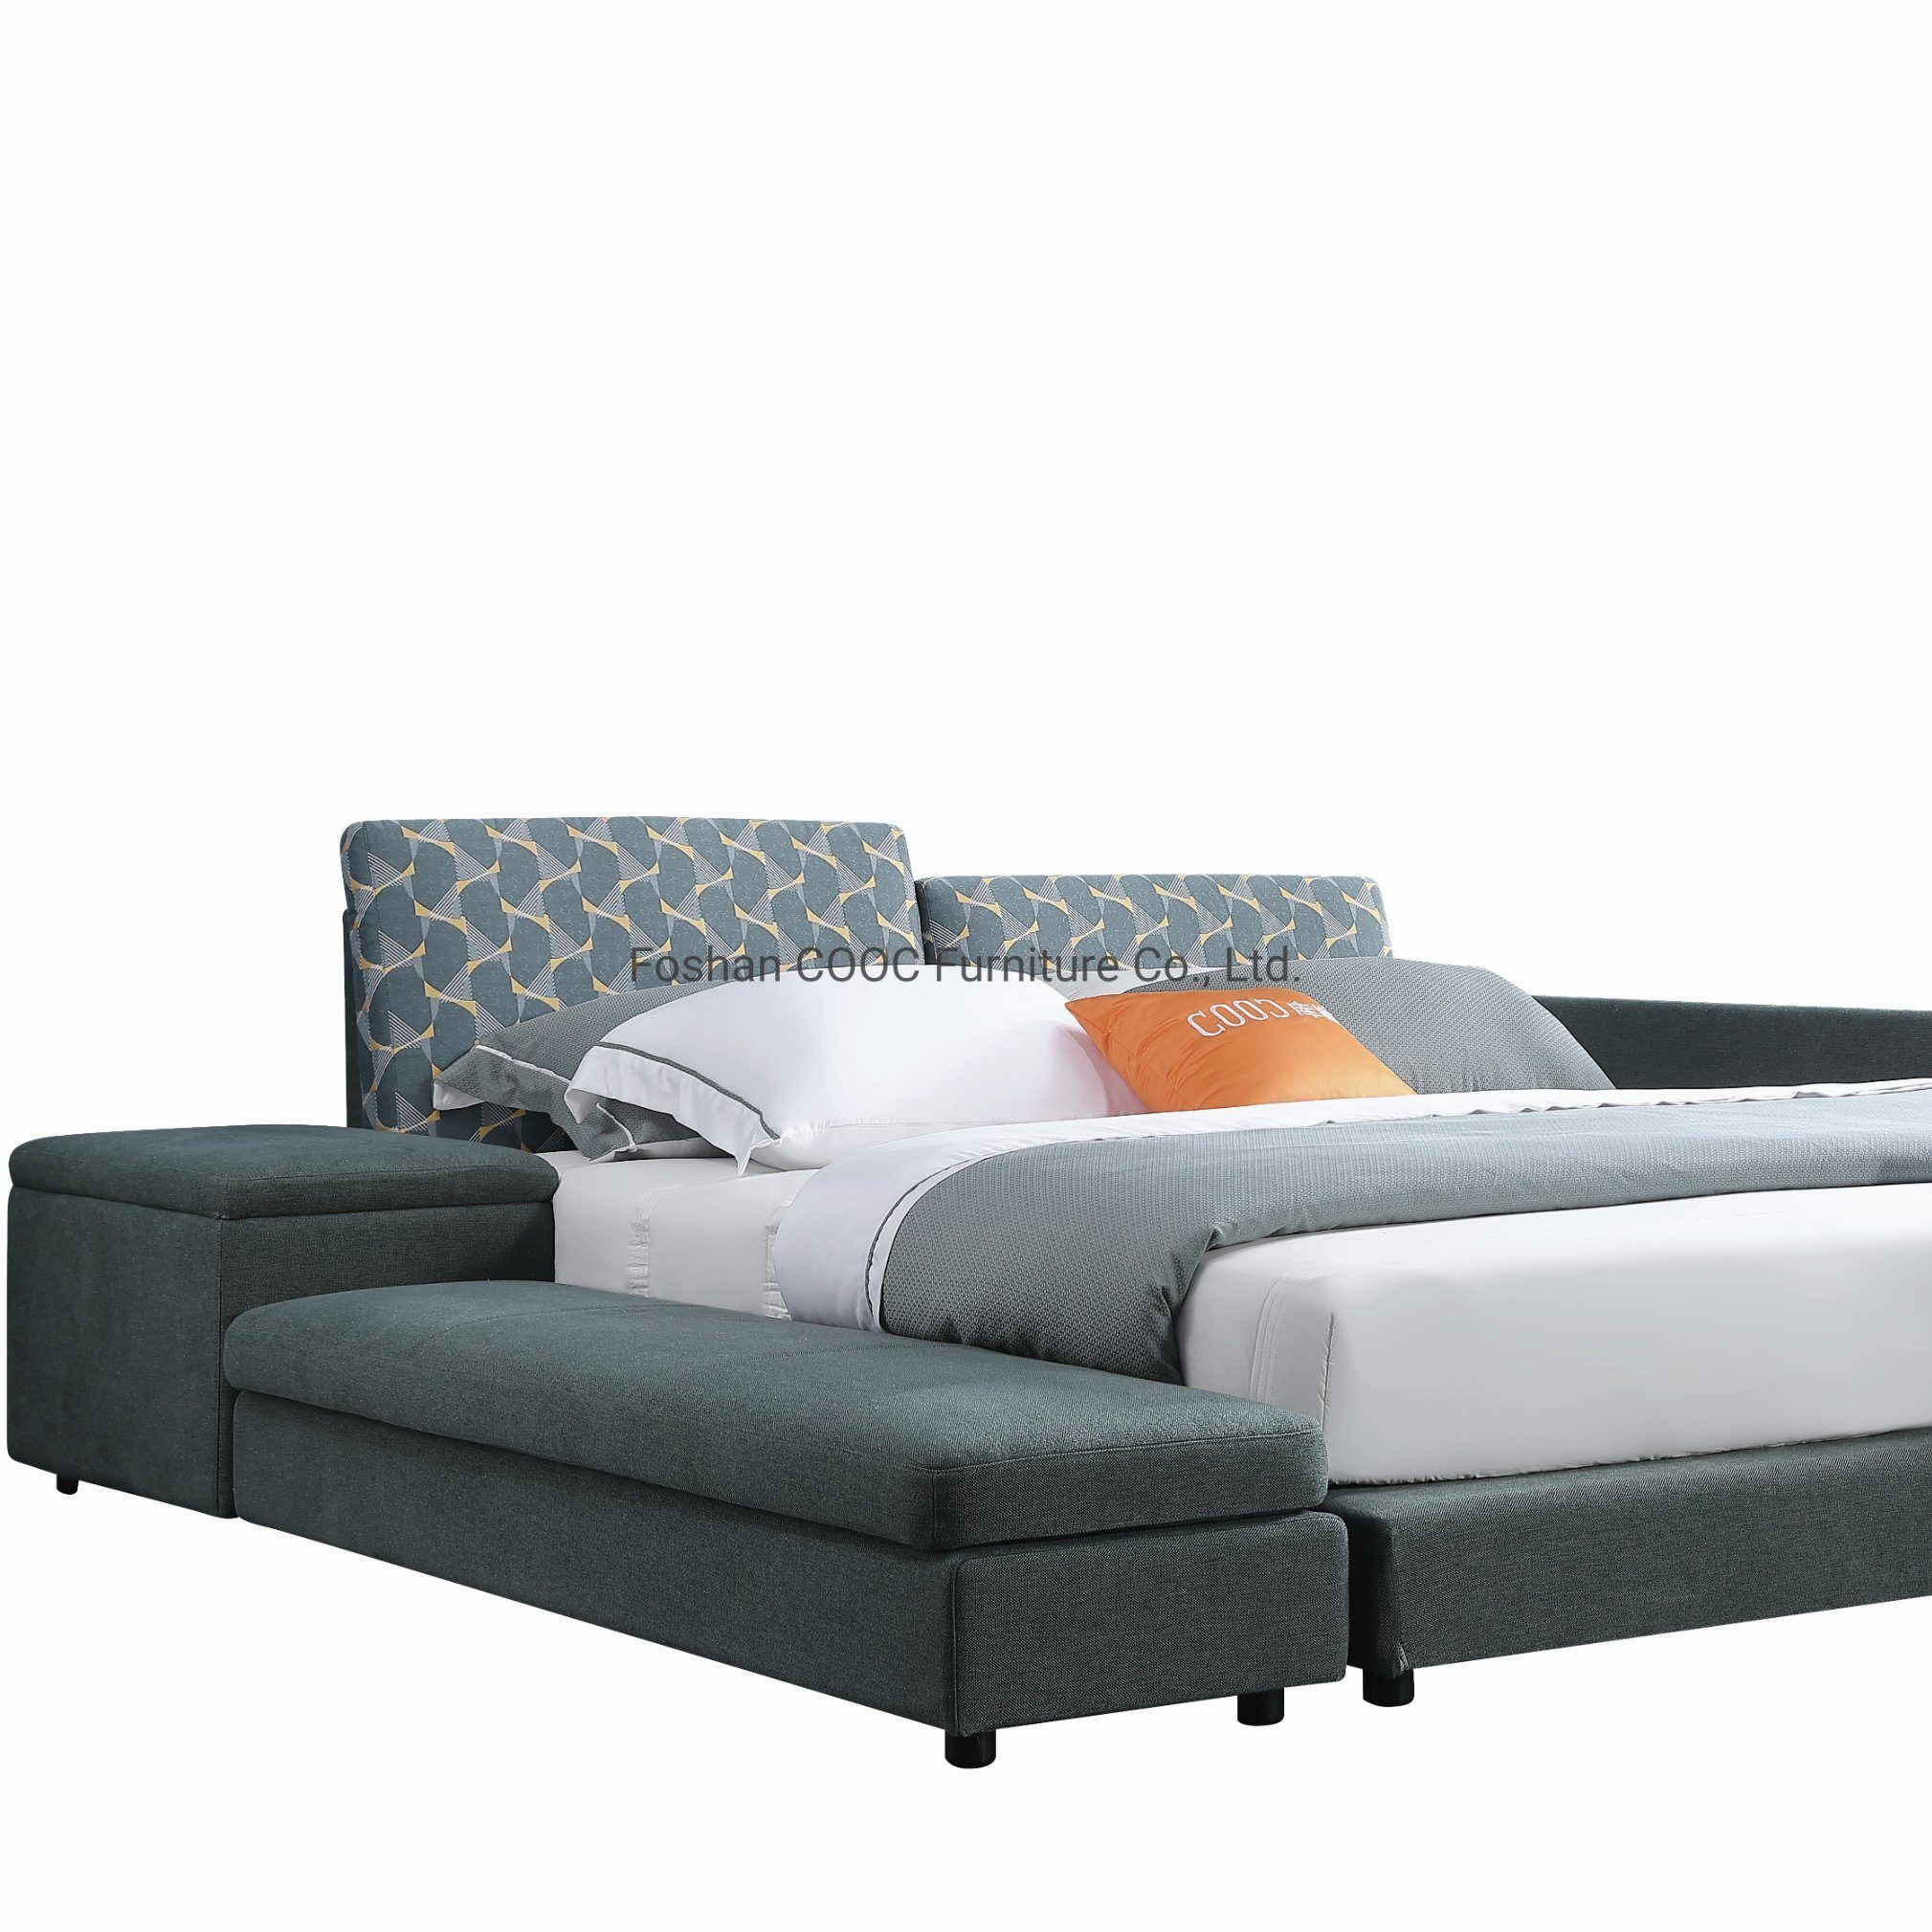 China Designer Bedroom Furniture King Size Bed With Storage Cabinet China King Bed Living Room Furniture